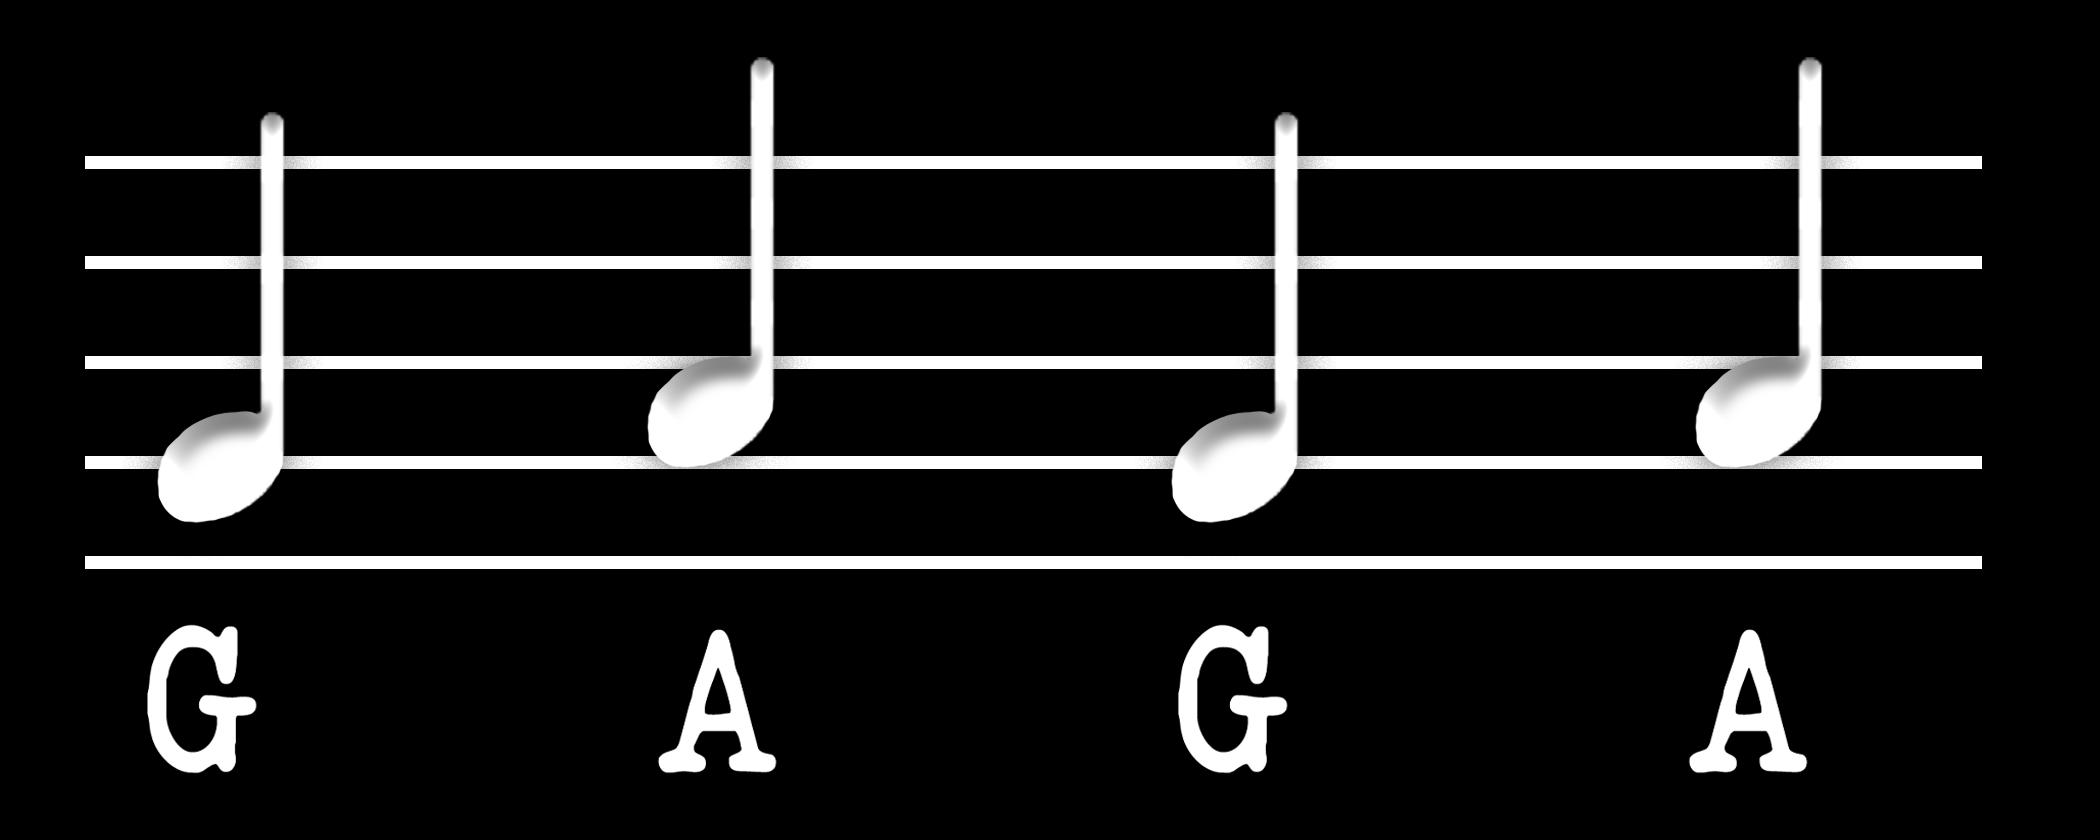 Bezel-Gaga-Album-Black.png